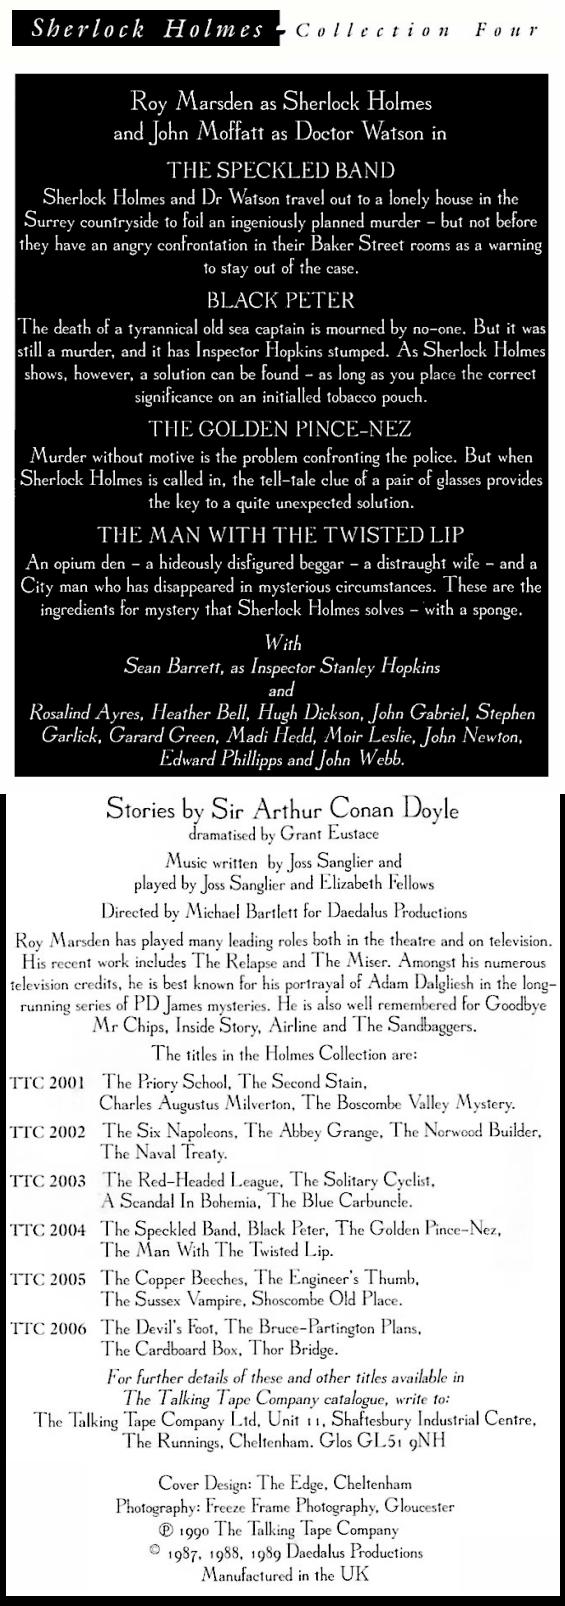 BFS Audio - Sherlock Holmes Collection Four - interior details